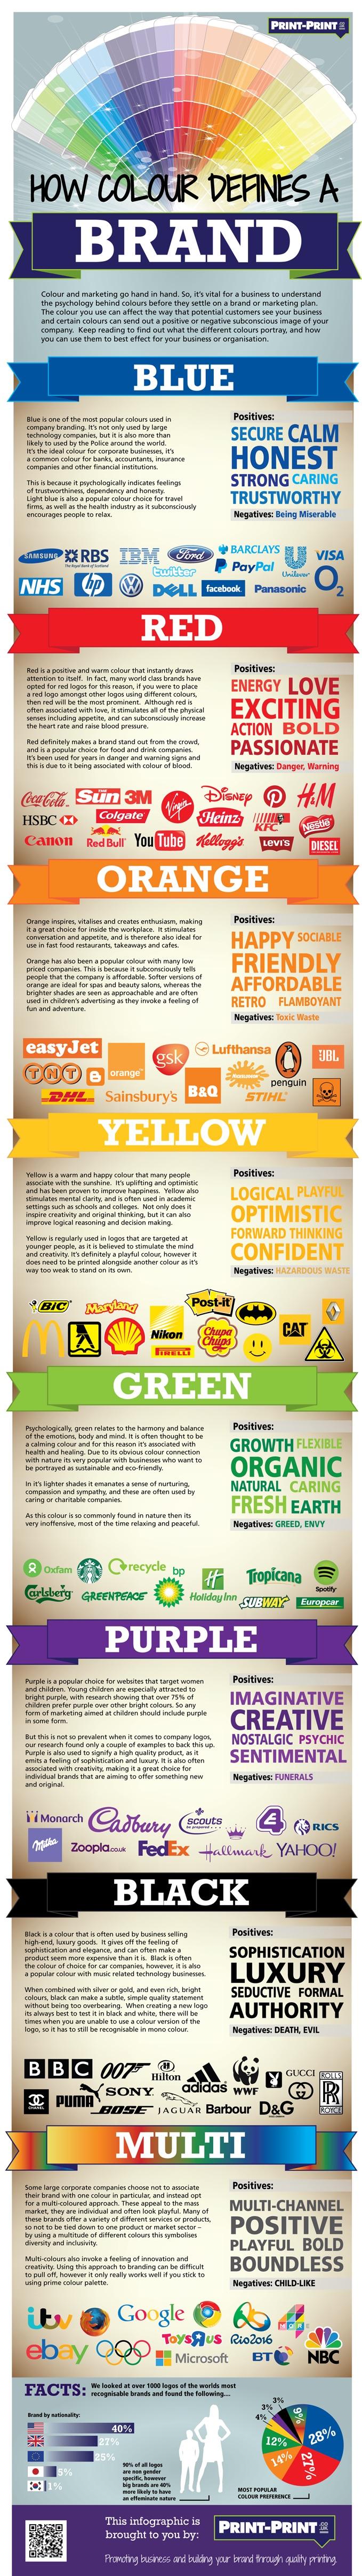 How colour defines a brand #language of color #color #brand